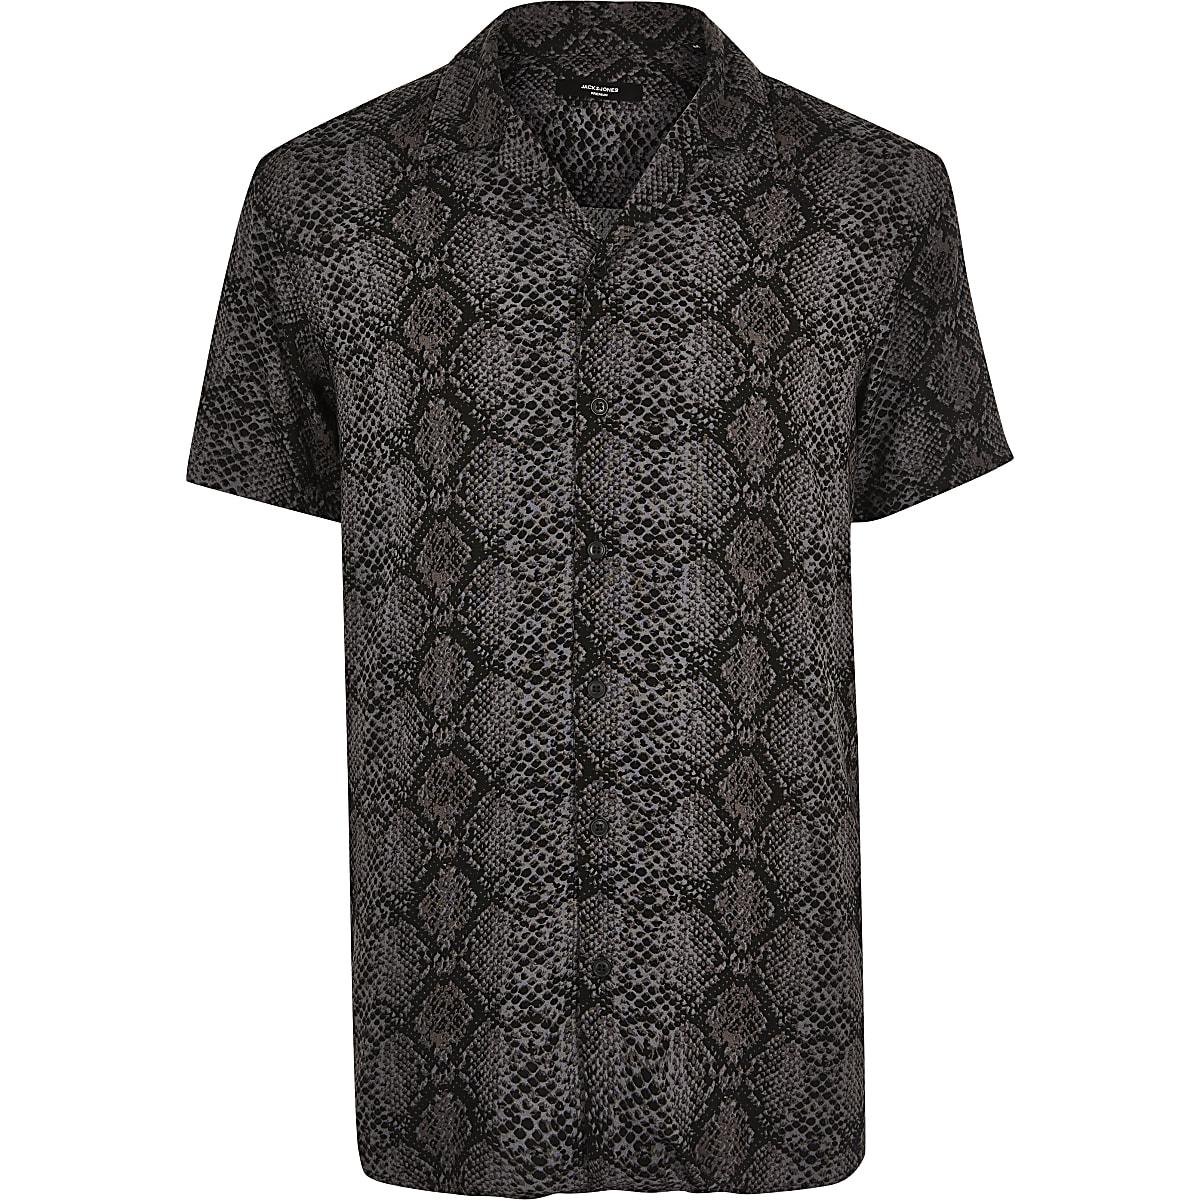 Jack and Jones grey snake short sleeve shirt